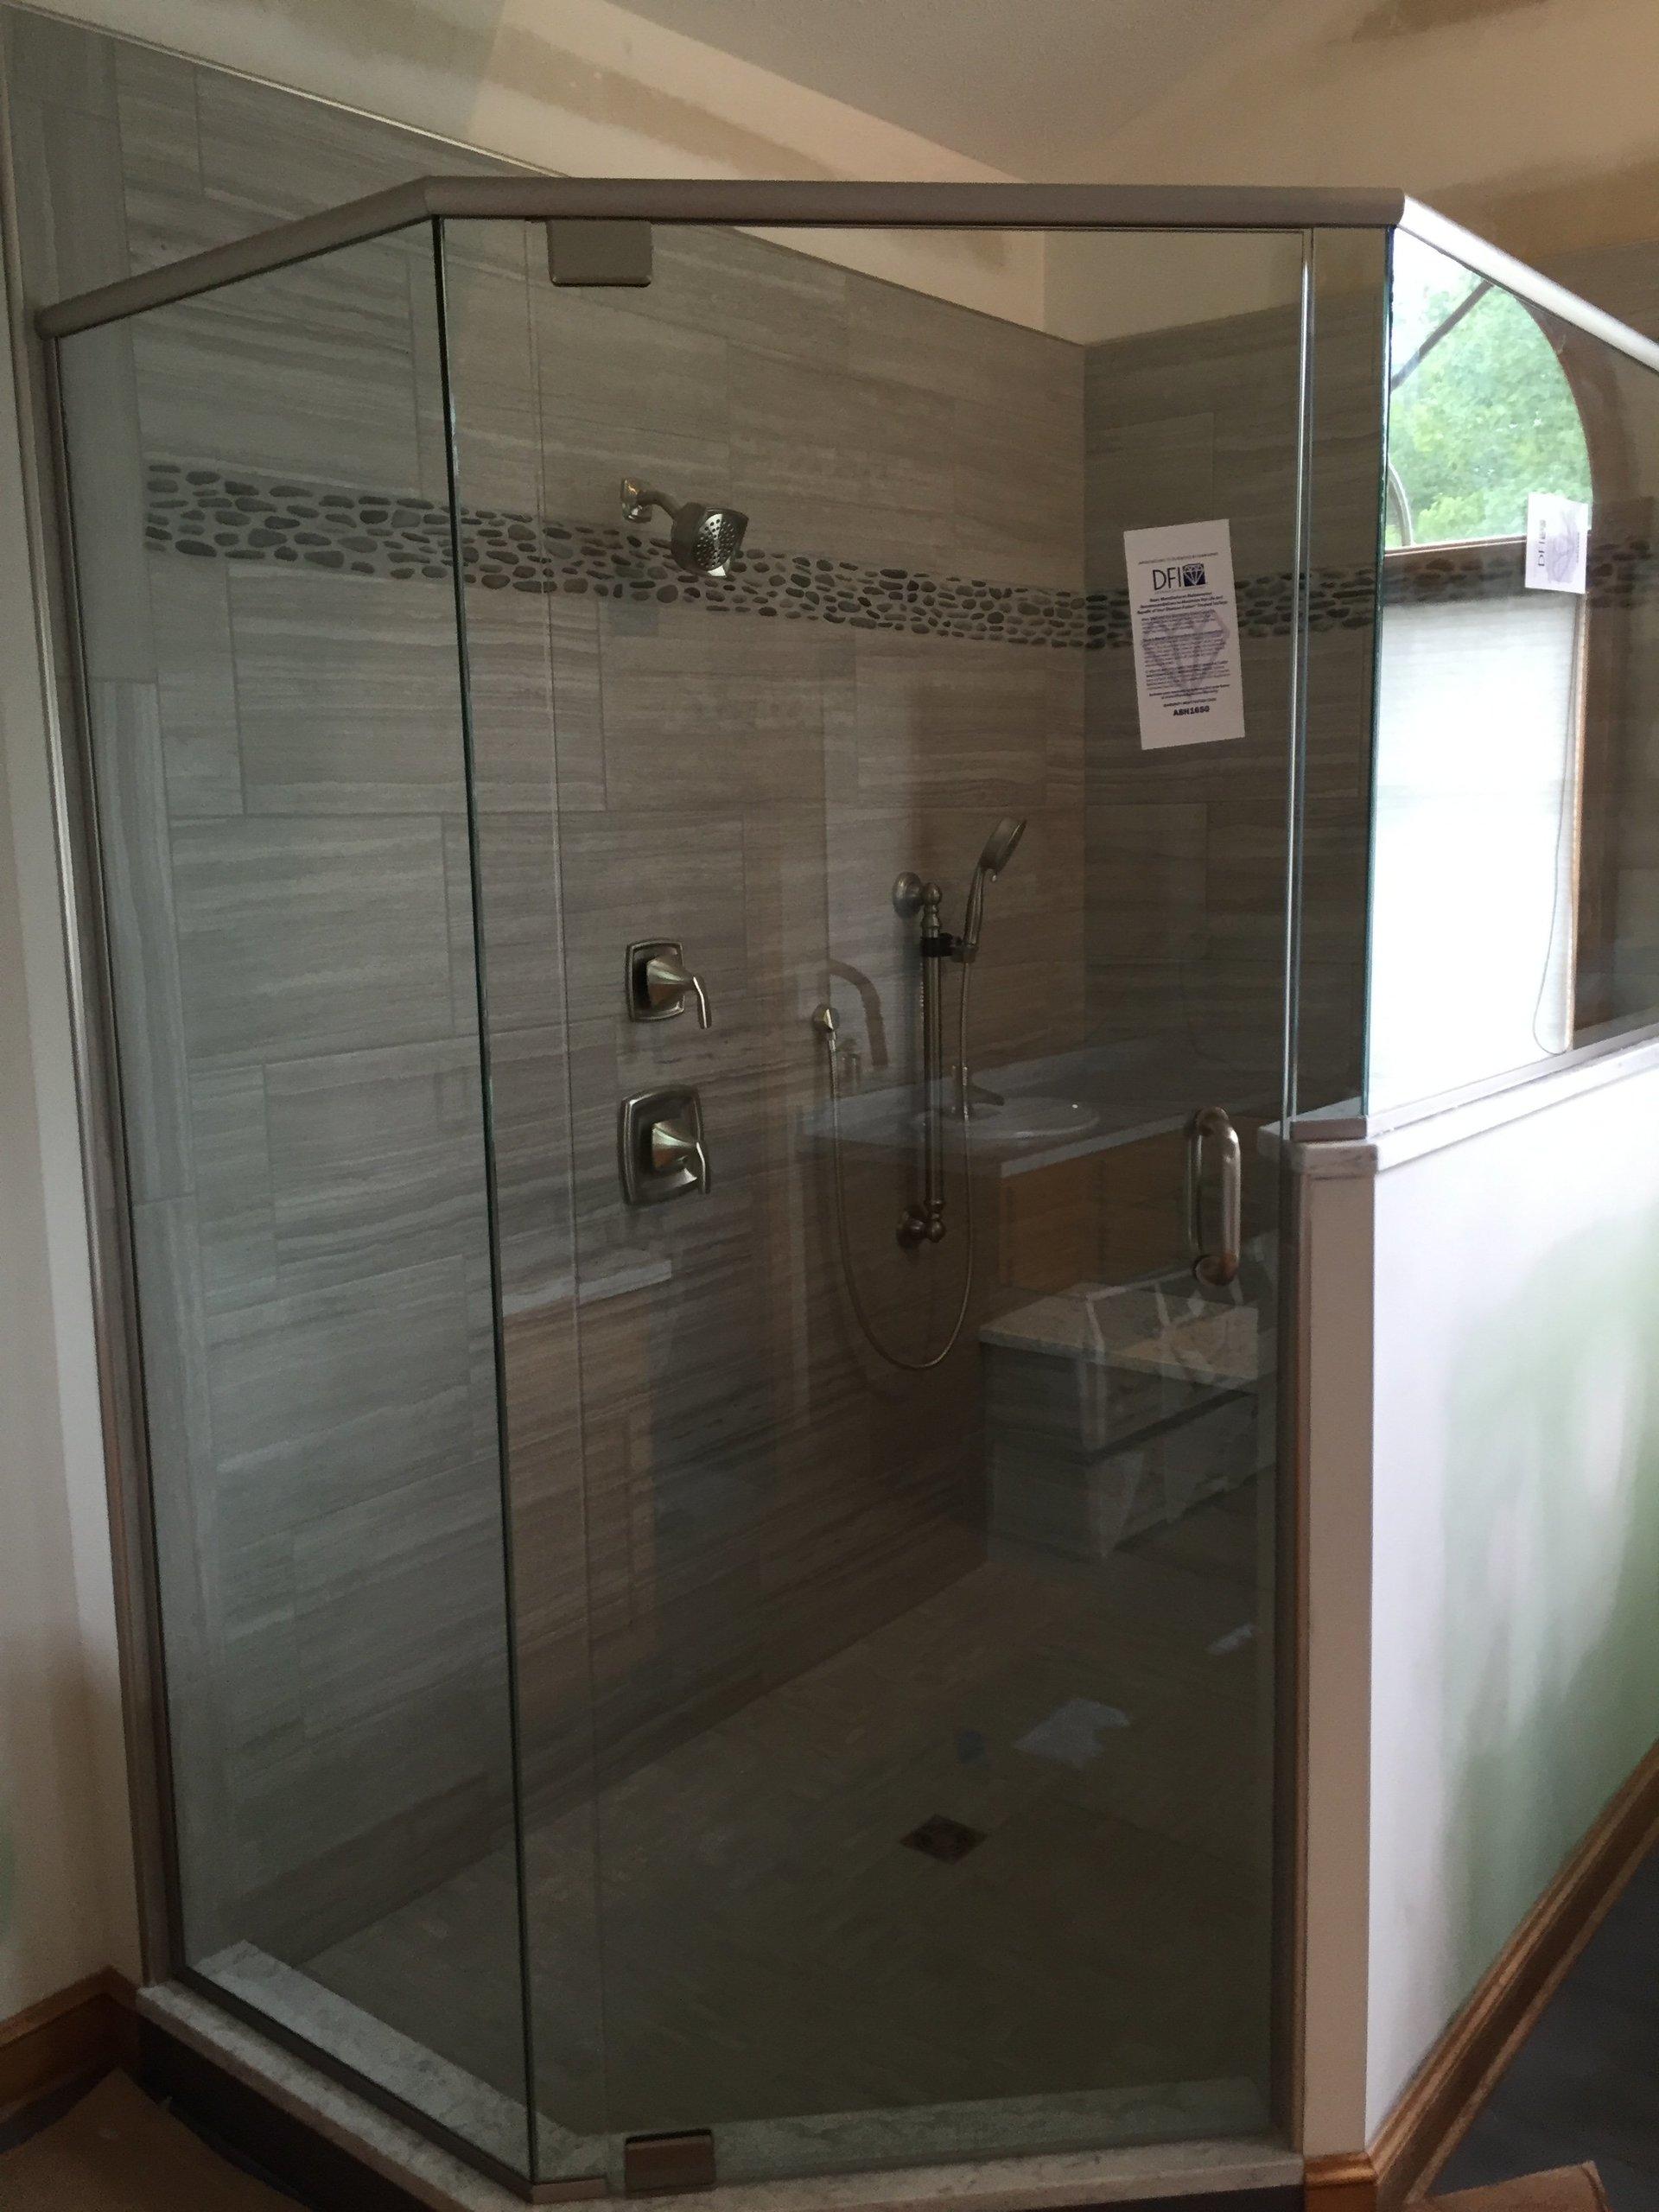 shower am dec doors photo full llc after update portfolio gn construction fb renovation house splendor